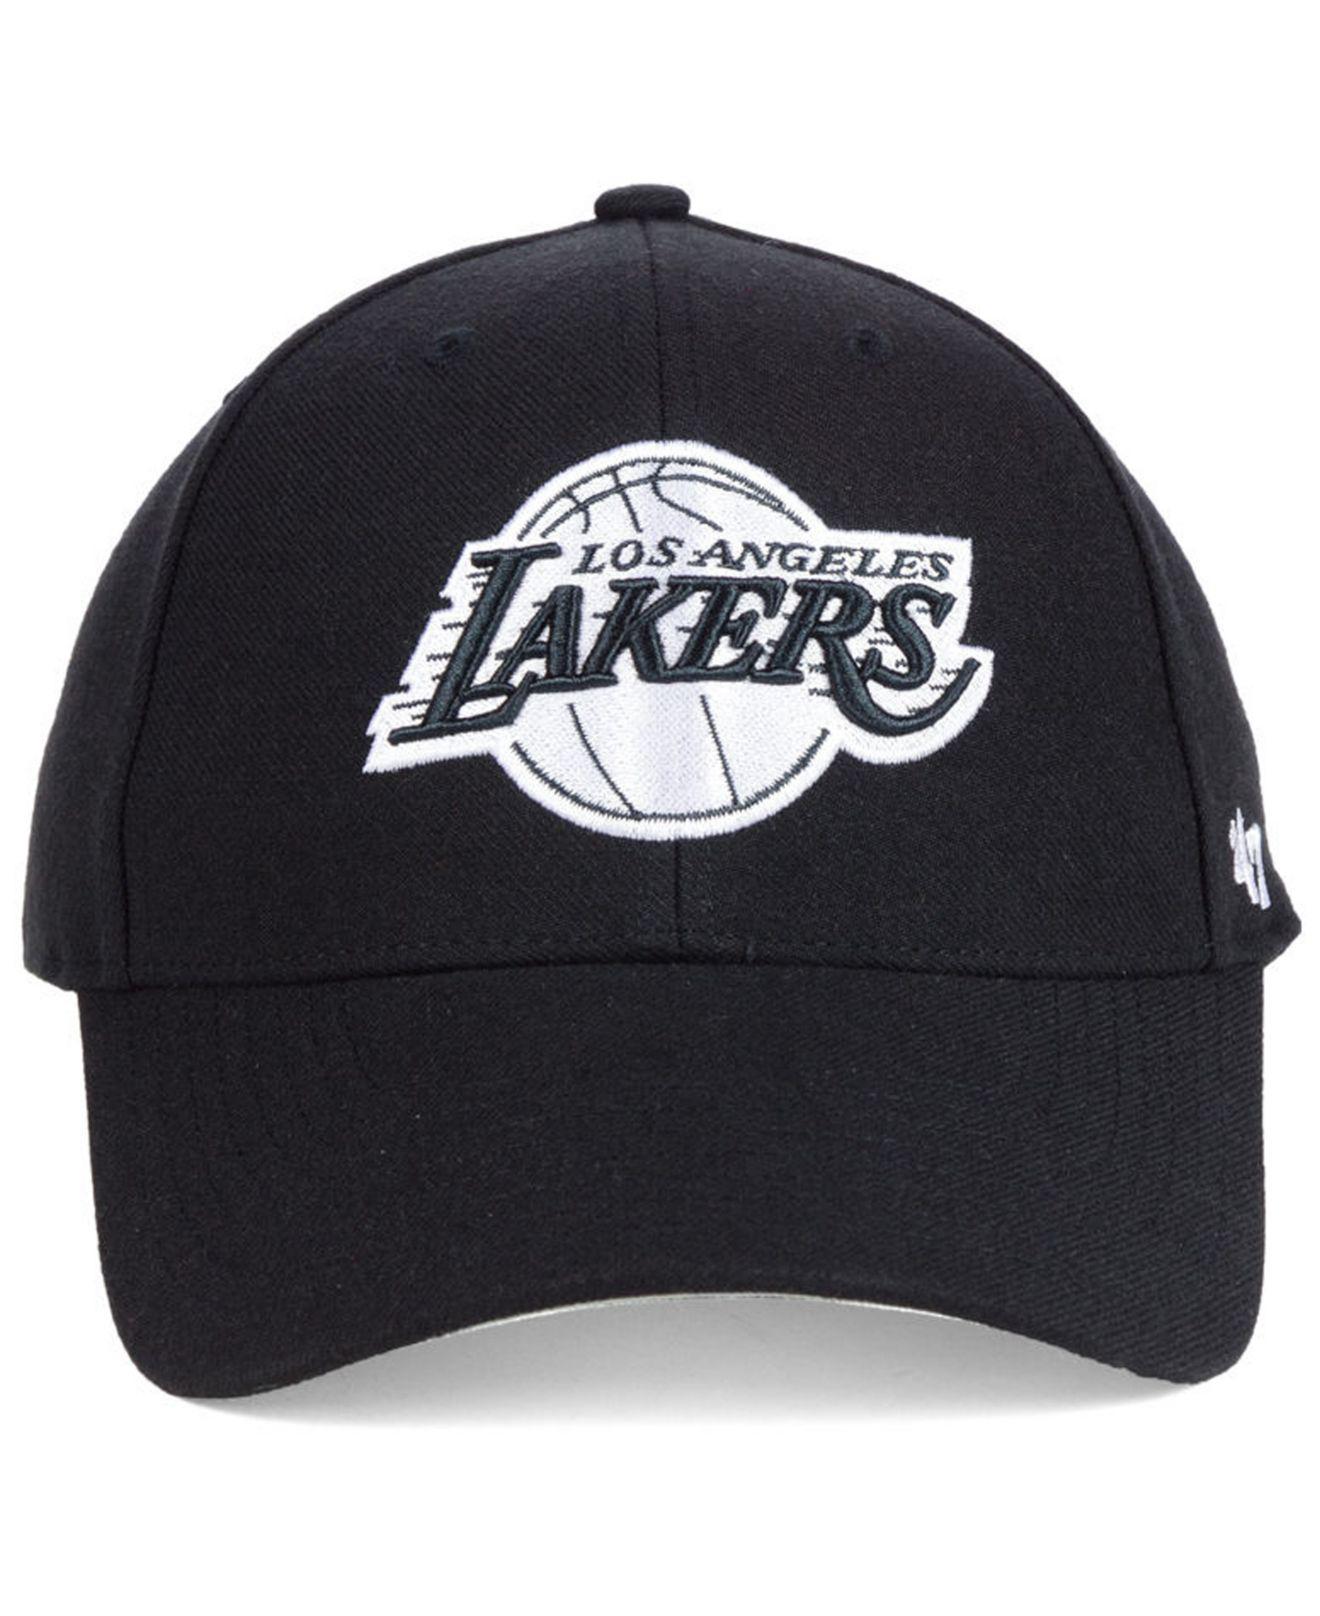 ed897cc9ece Lyst - 47 Brand Los Angeles Lakers Black White Mvp Cap in Black for Men